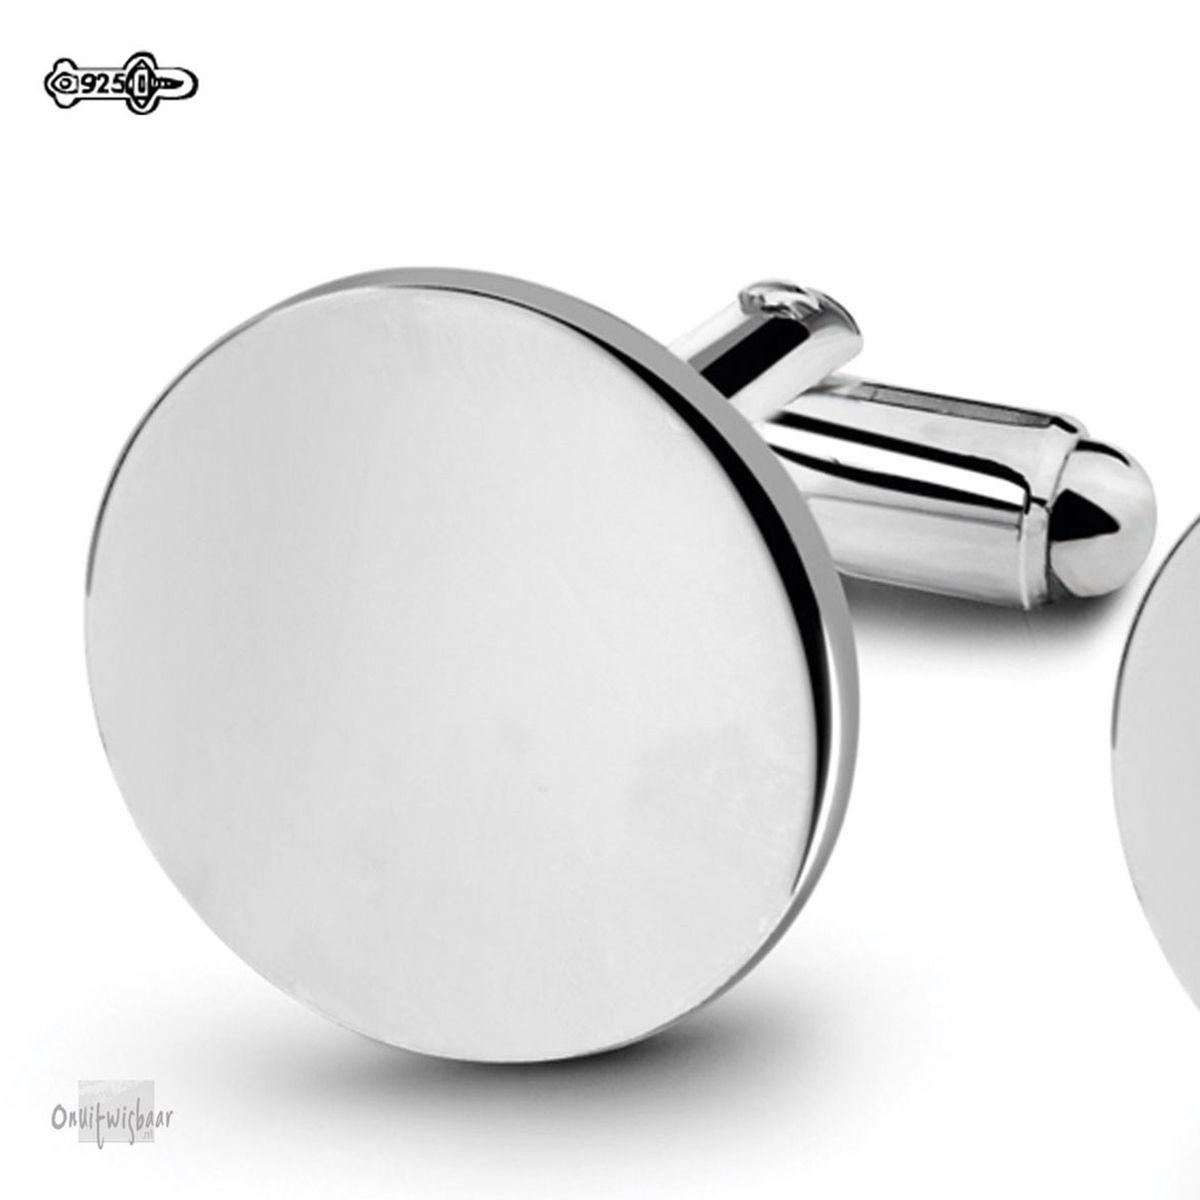 manchetknopen rond zilver